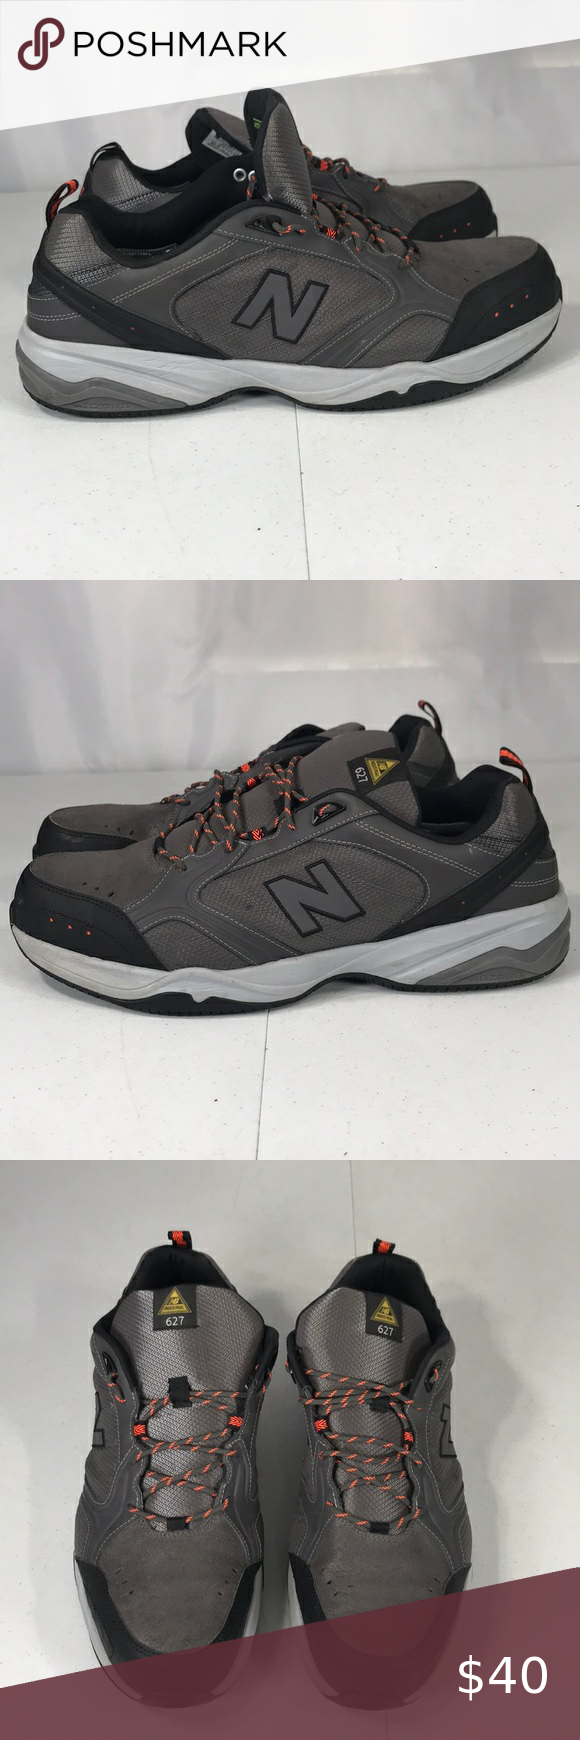 New balance industrial 627 steel toe